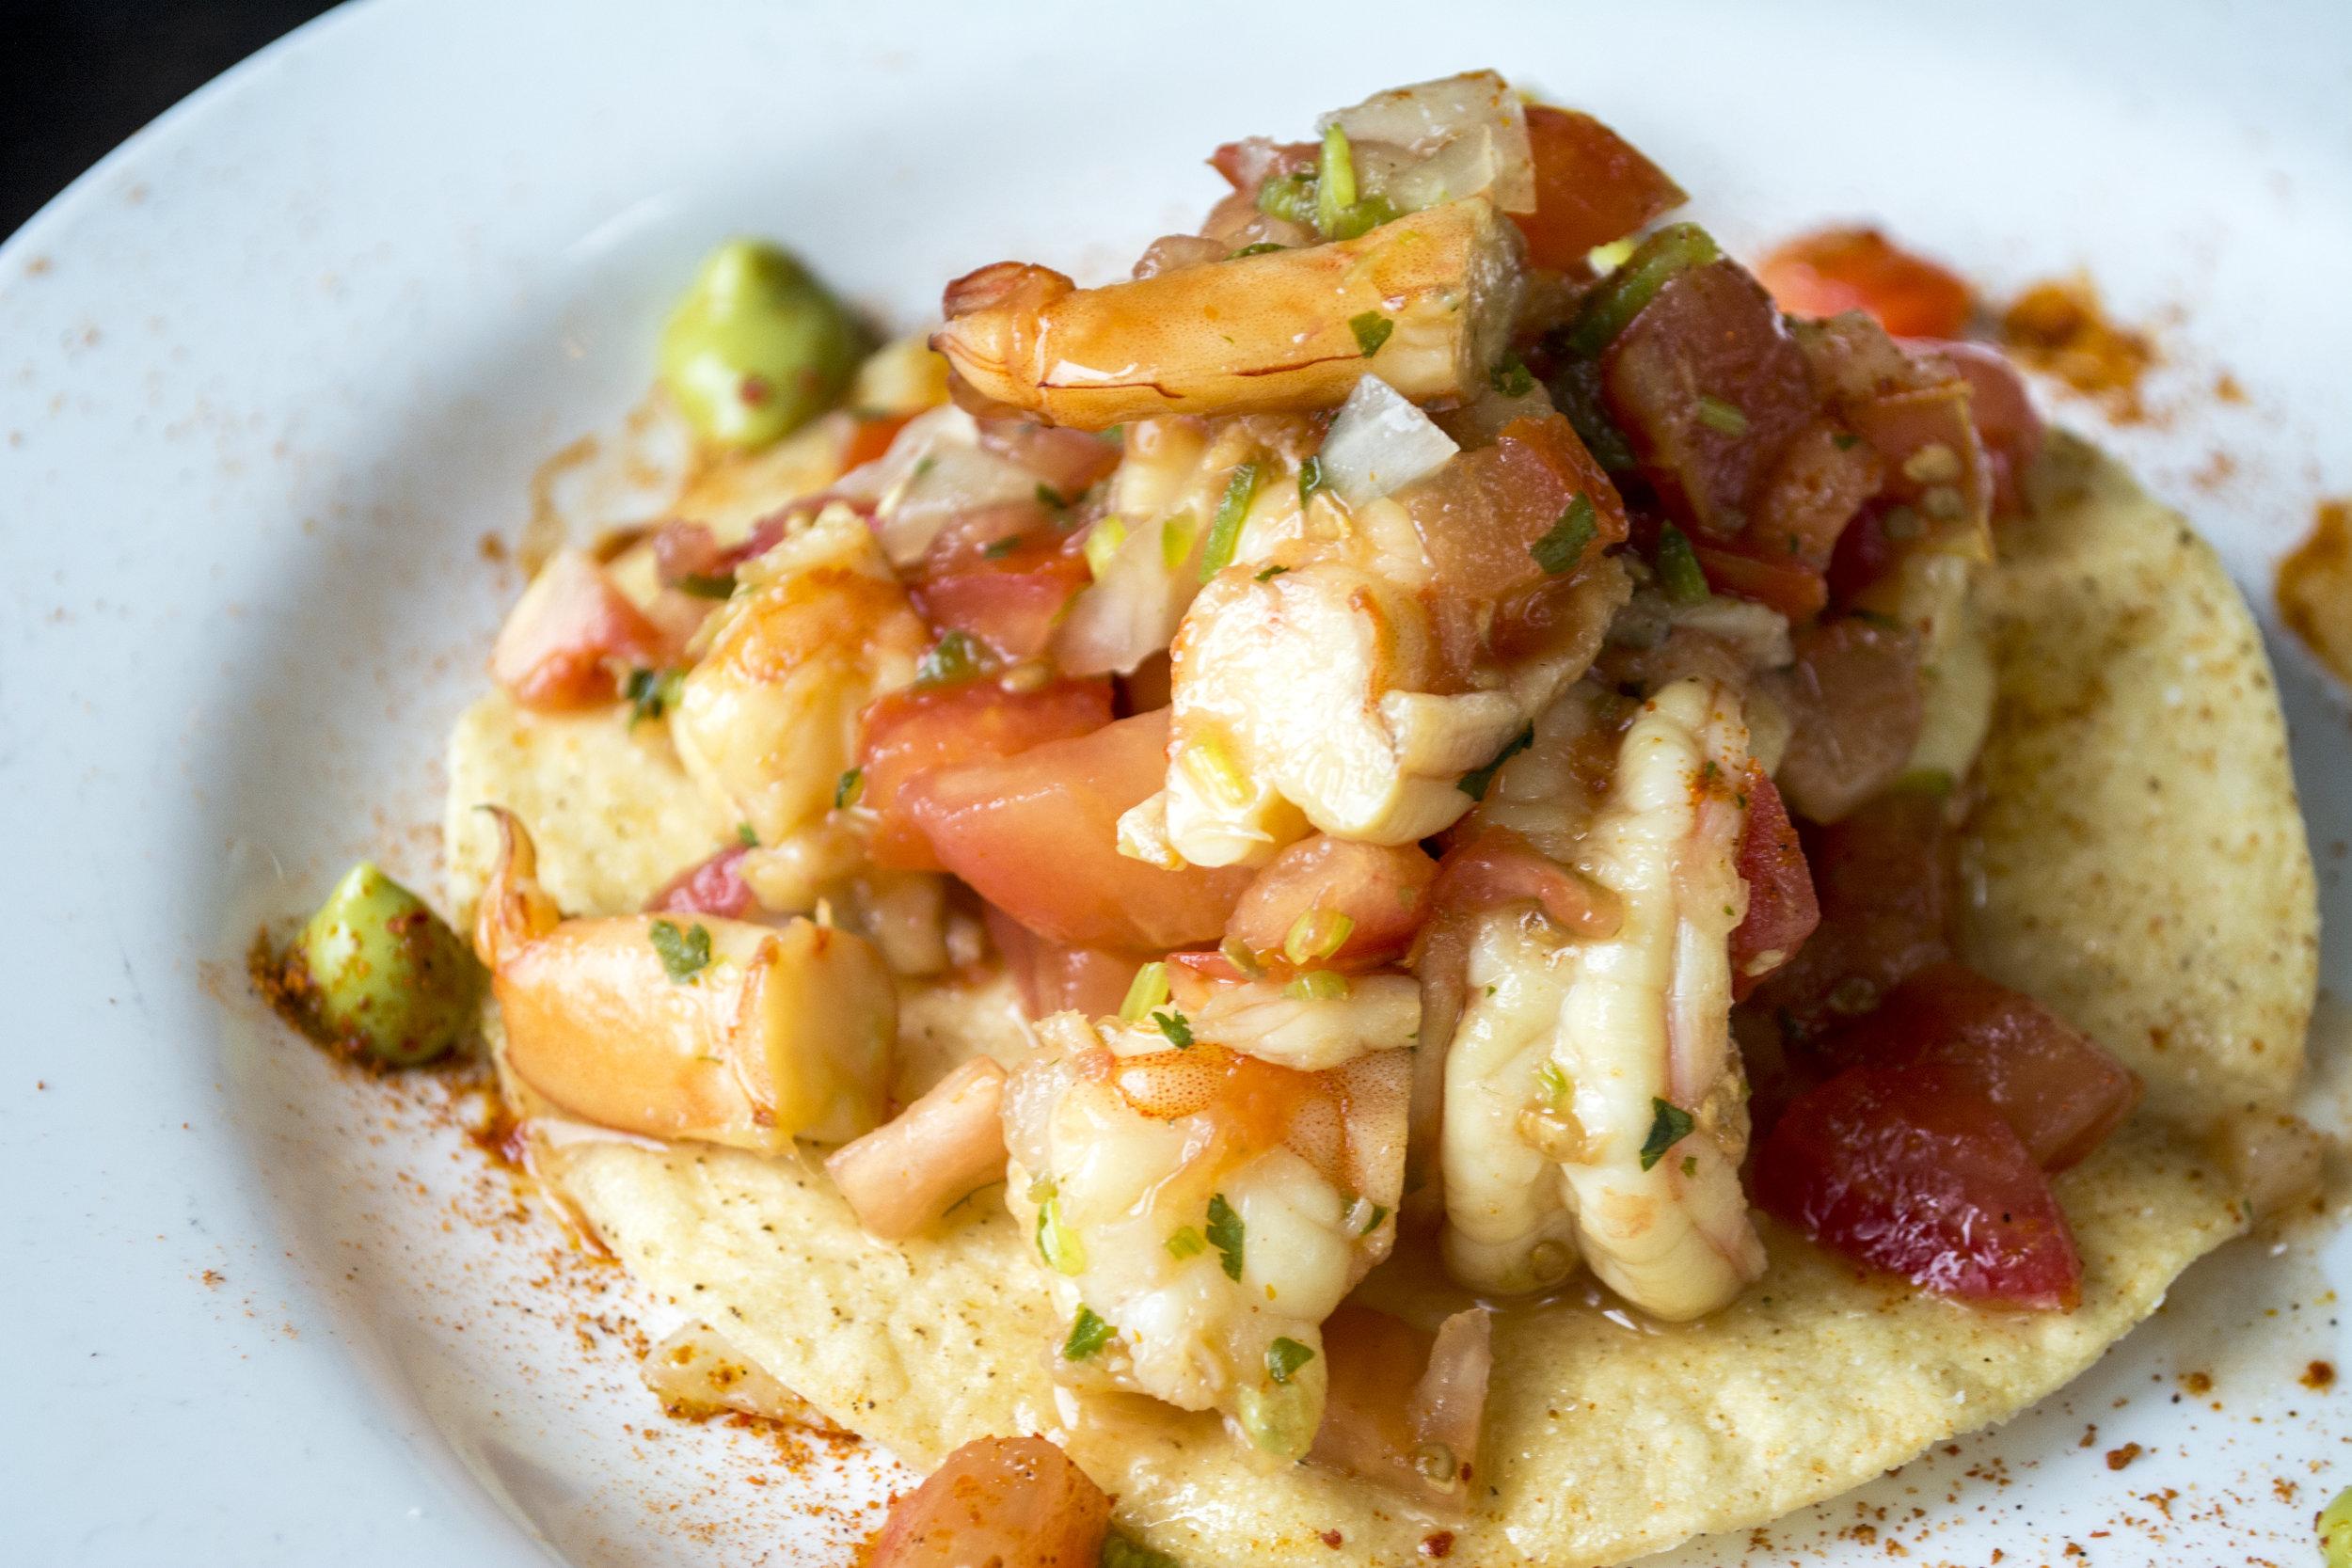 Shrimp Ceviche Tostada ($14) features shrimp, tomato, lime and jalapeno over a crisp tortilla.